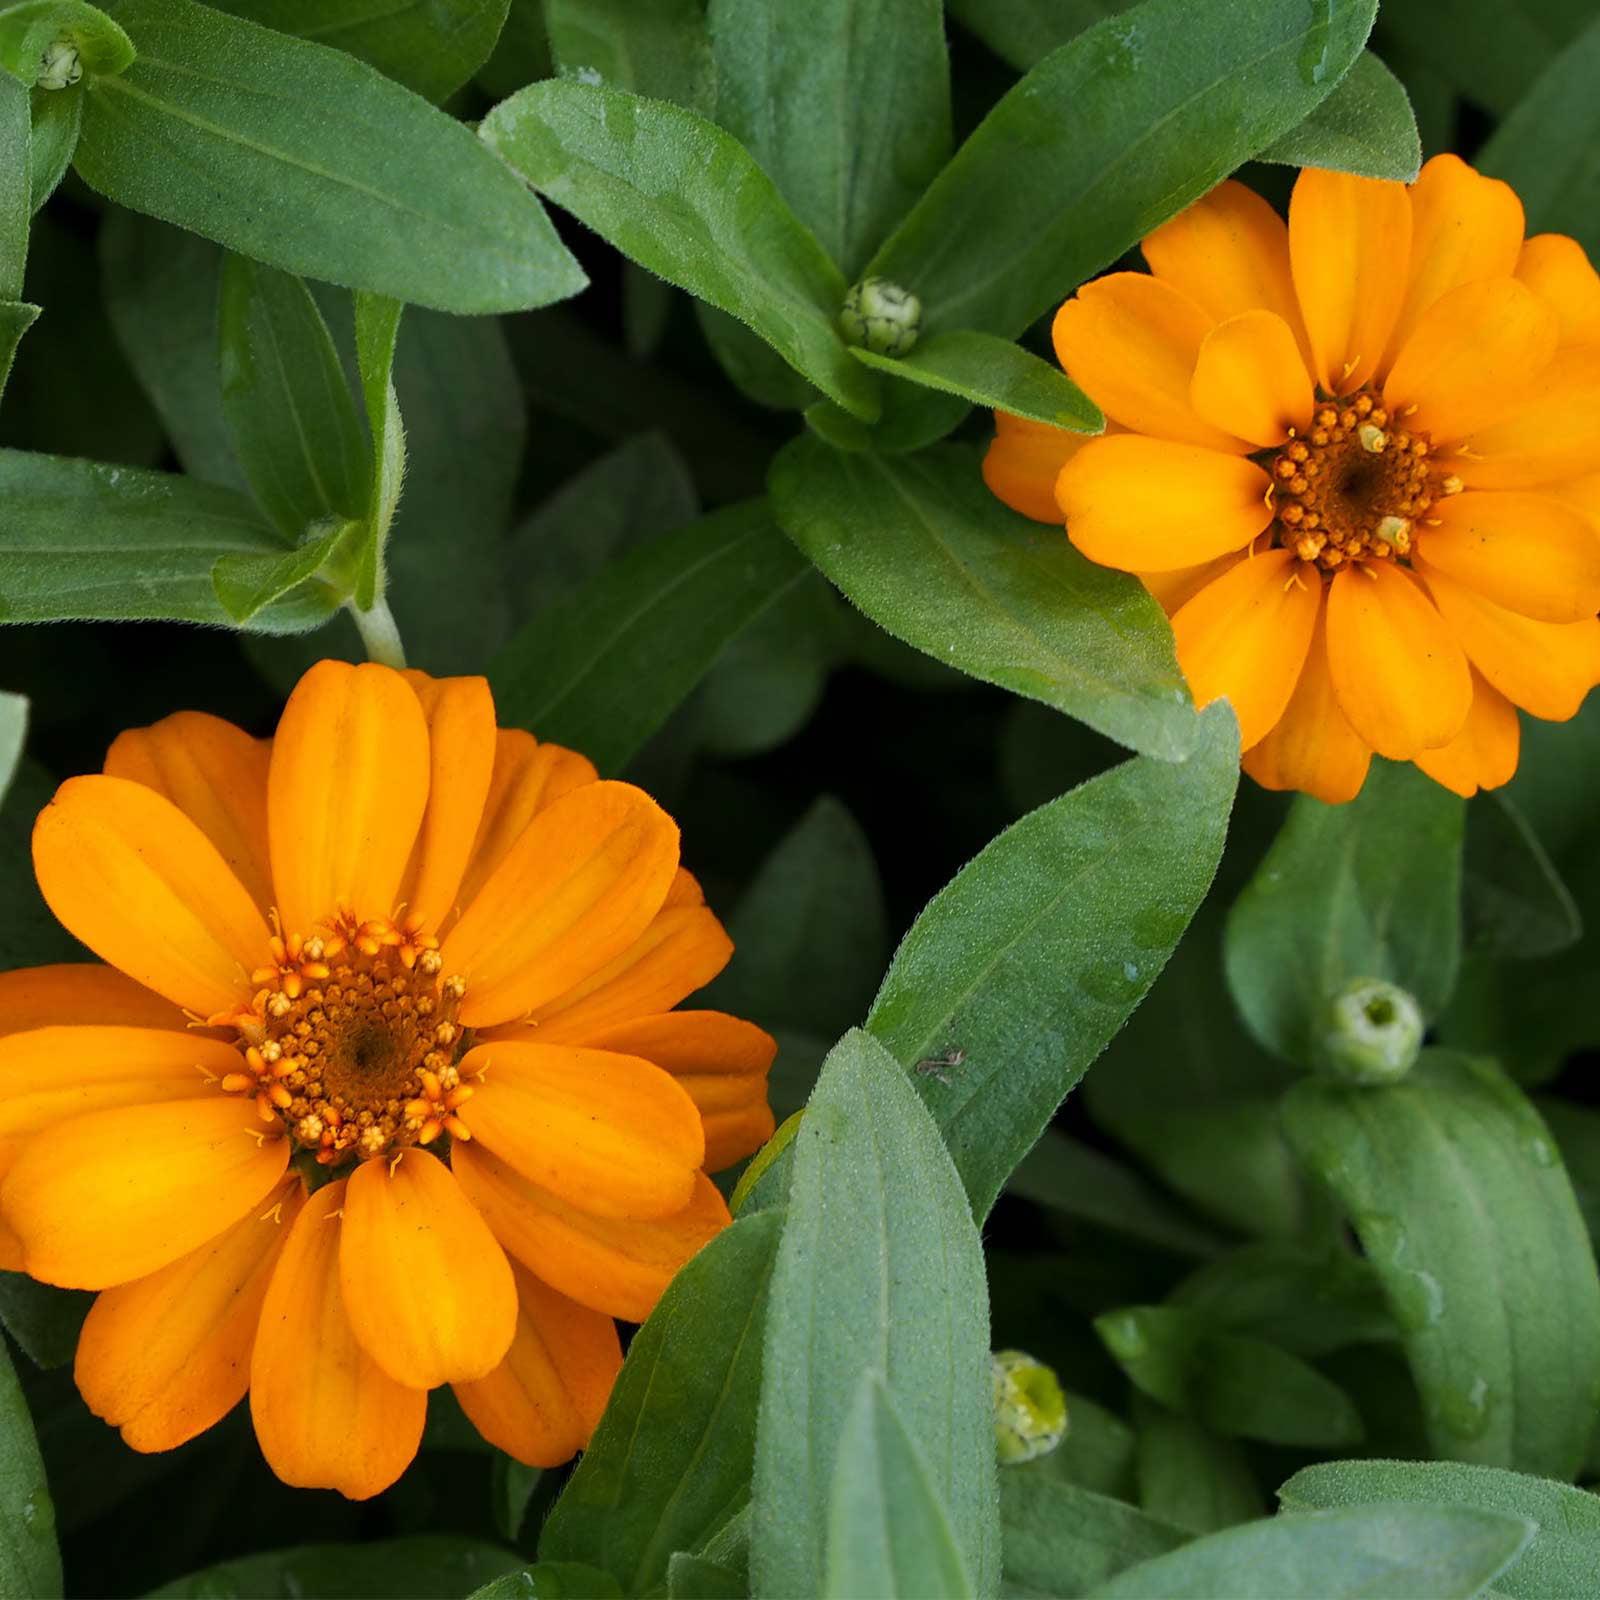 Zinnia Flower Garden Seeds - Profusion Series - Orange - 100 Seeds - Annual Flower Gardening Seed - Zinnia hybrida